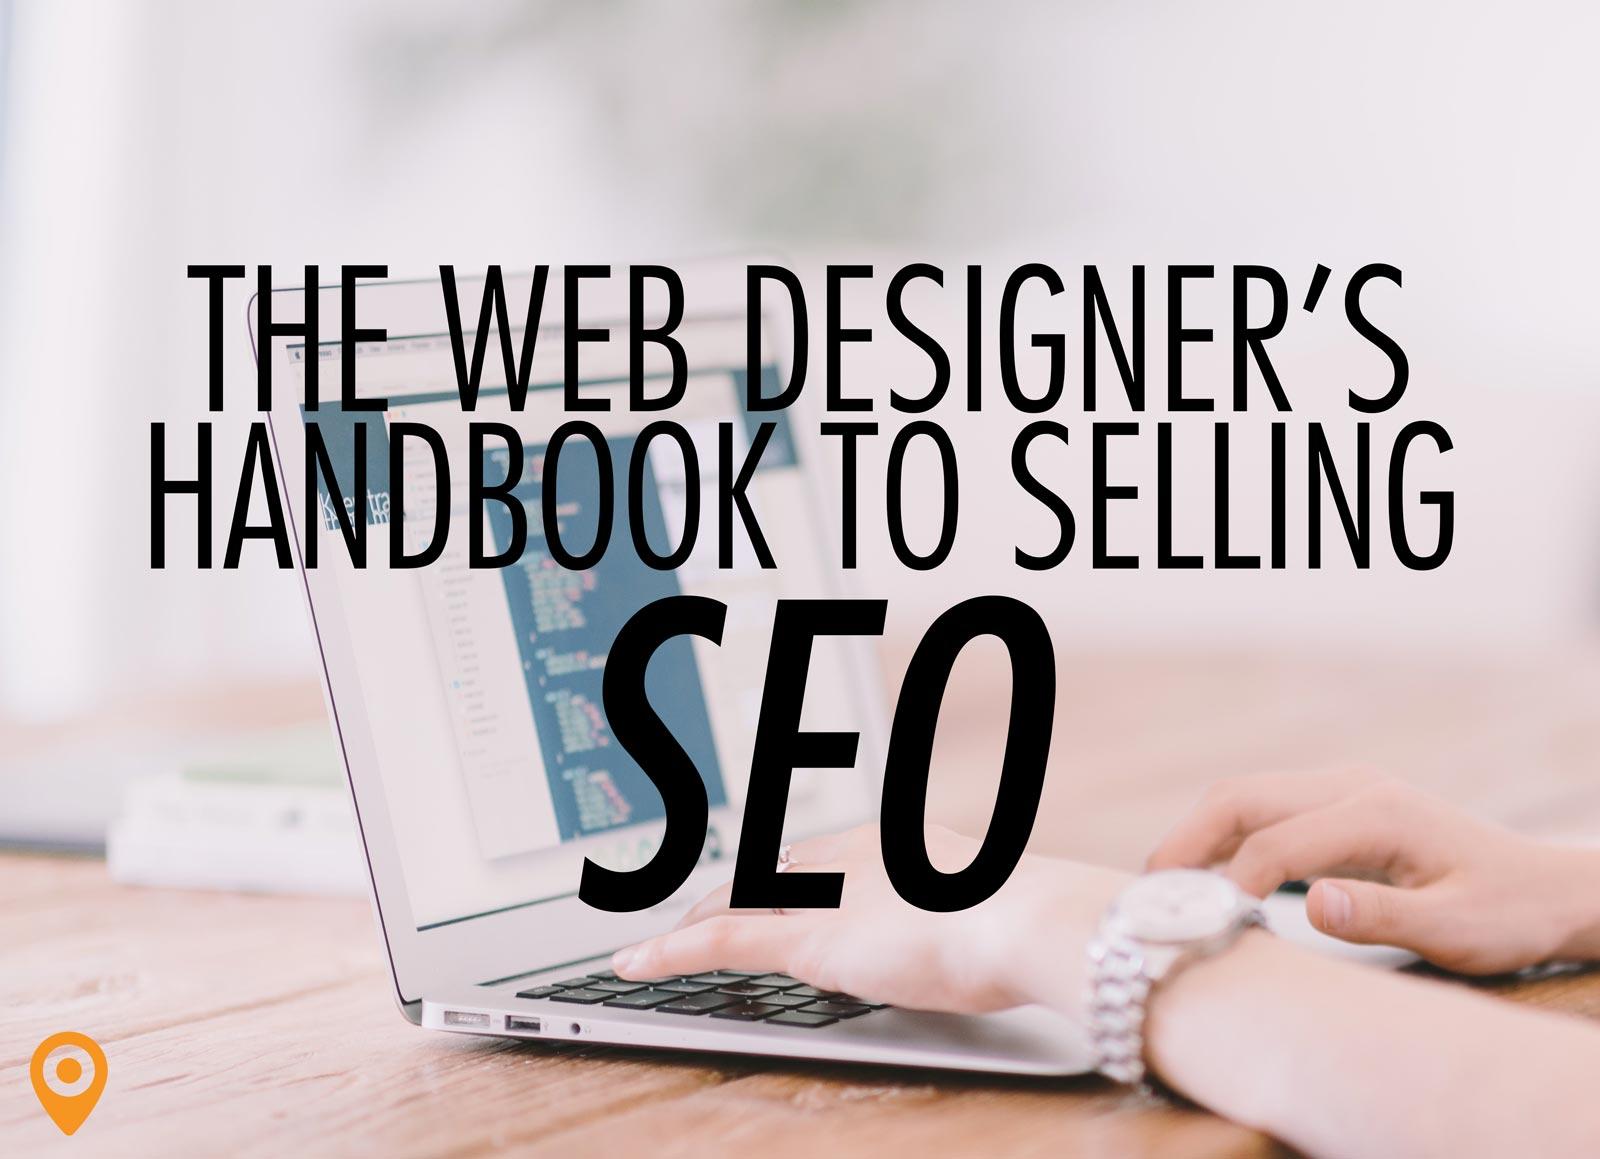 web_designers_handbook_selling_seo